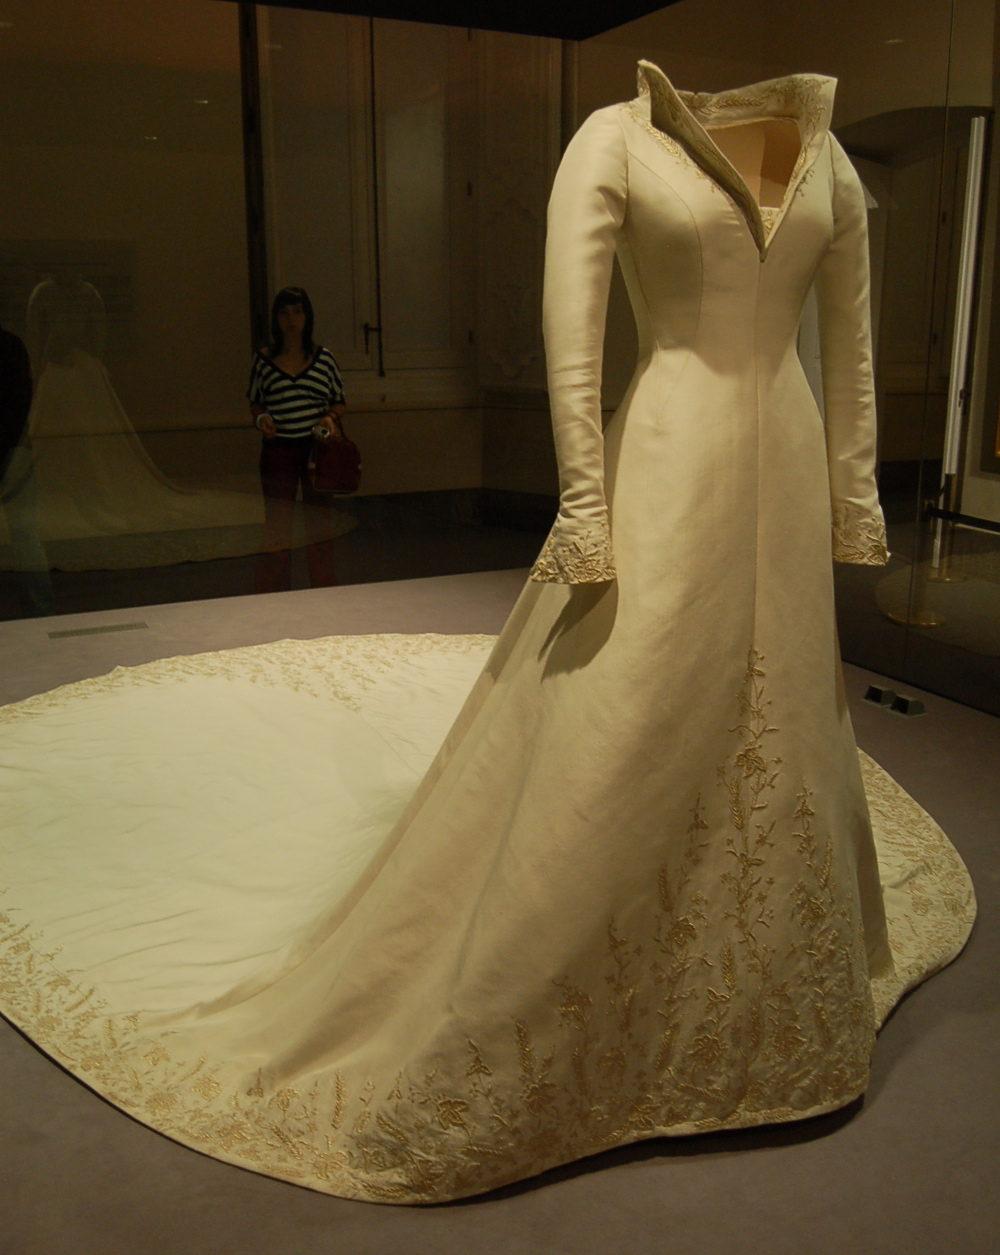 Fashion exhibitions: the wedding dress of Queen Letizia - Replicate ...